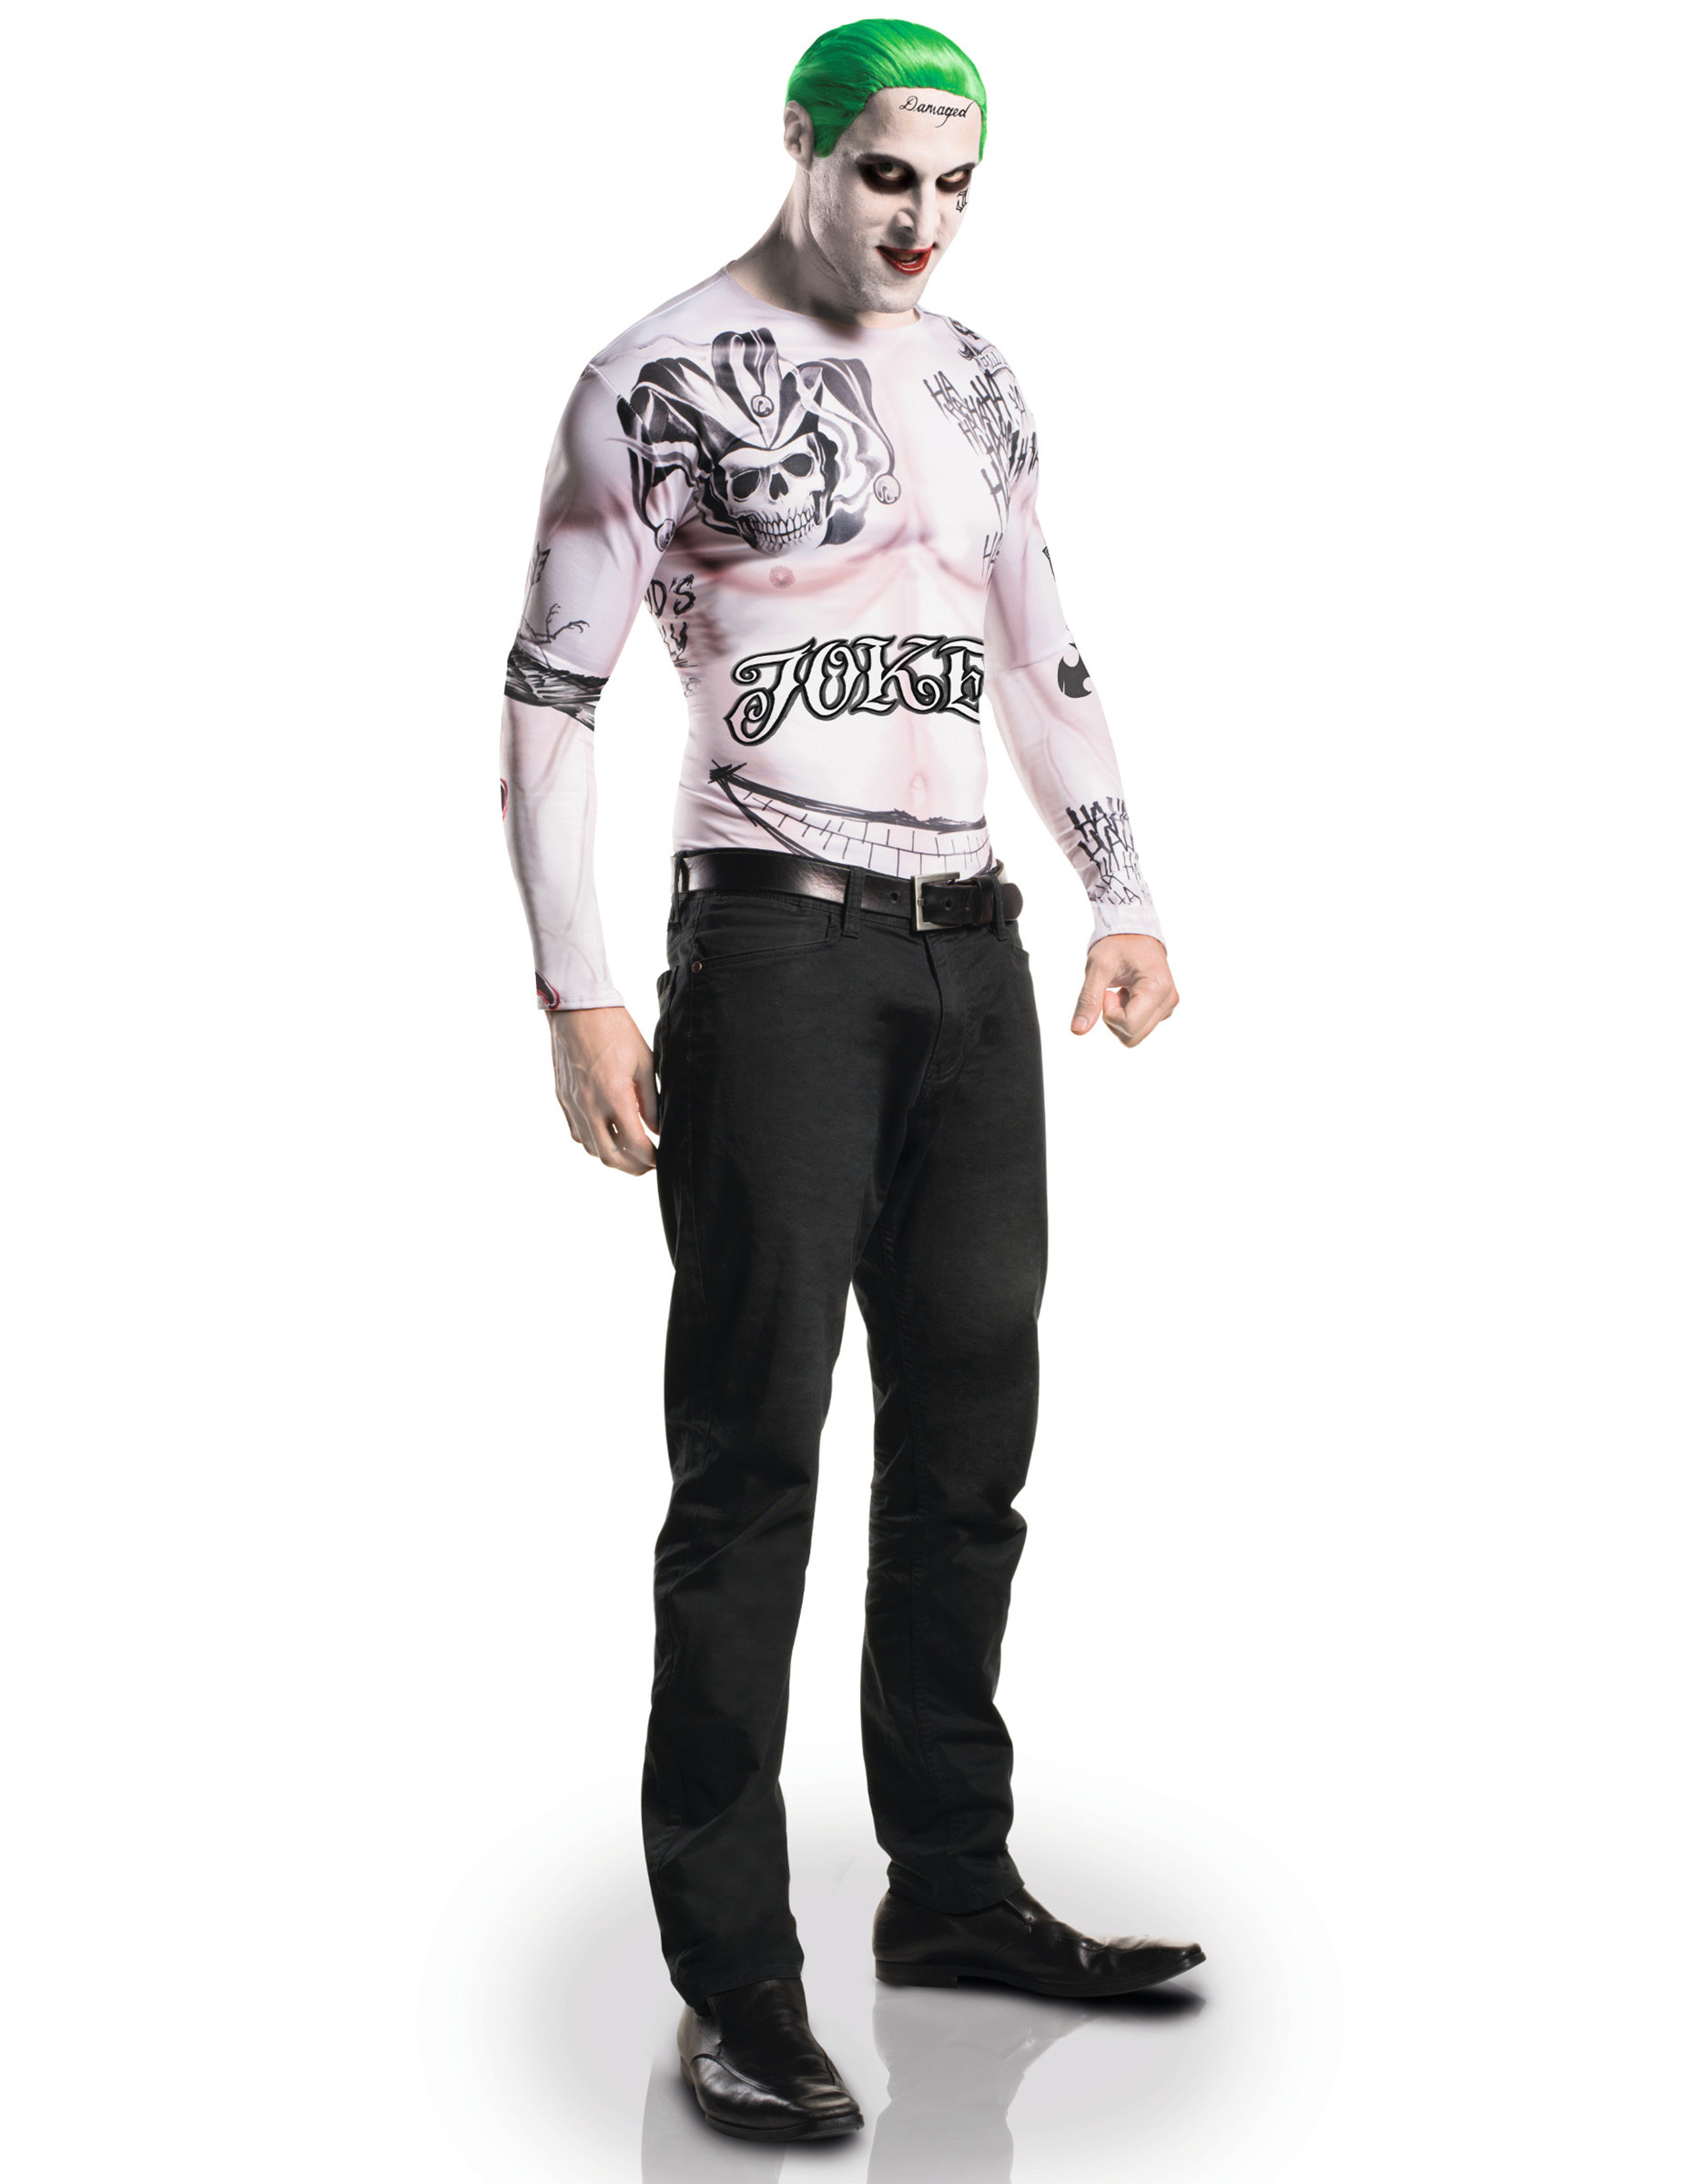 Joker Kostum Set Mit Schminke Suicide Squad 3 Teilig Bunt Gunstige